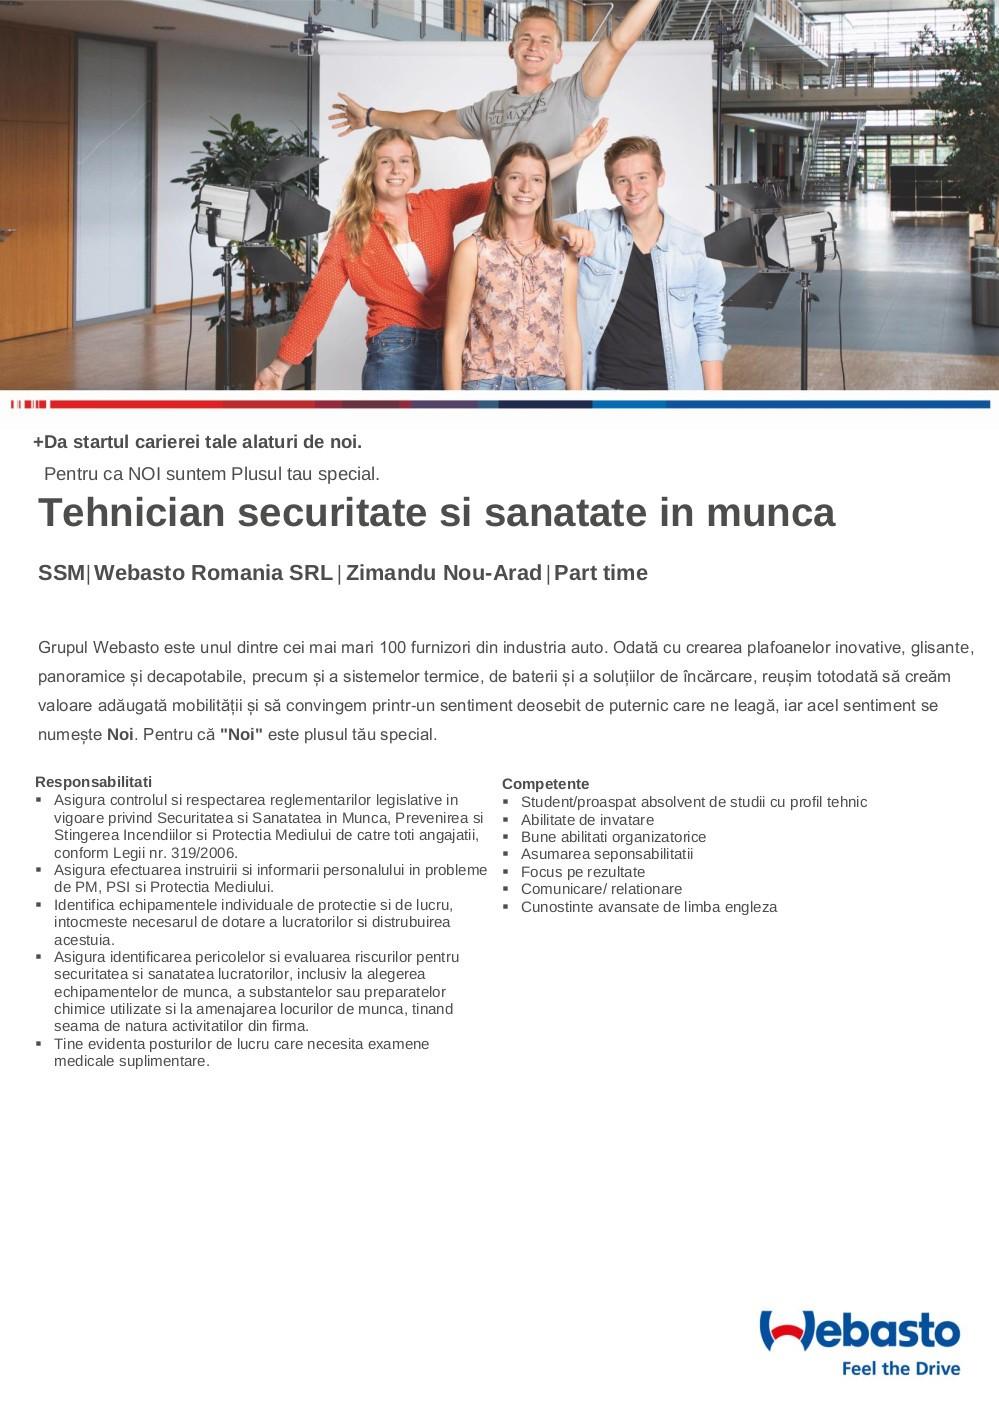 Tehnician securitate si sanatate in munca